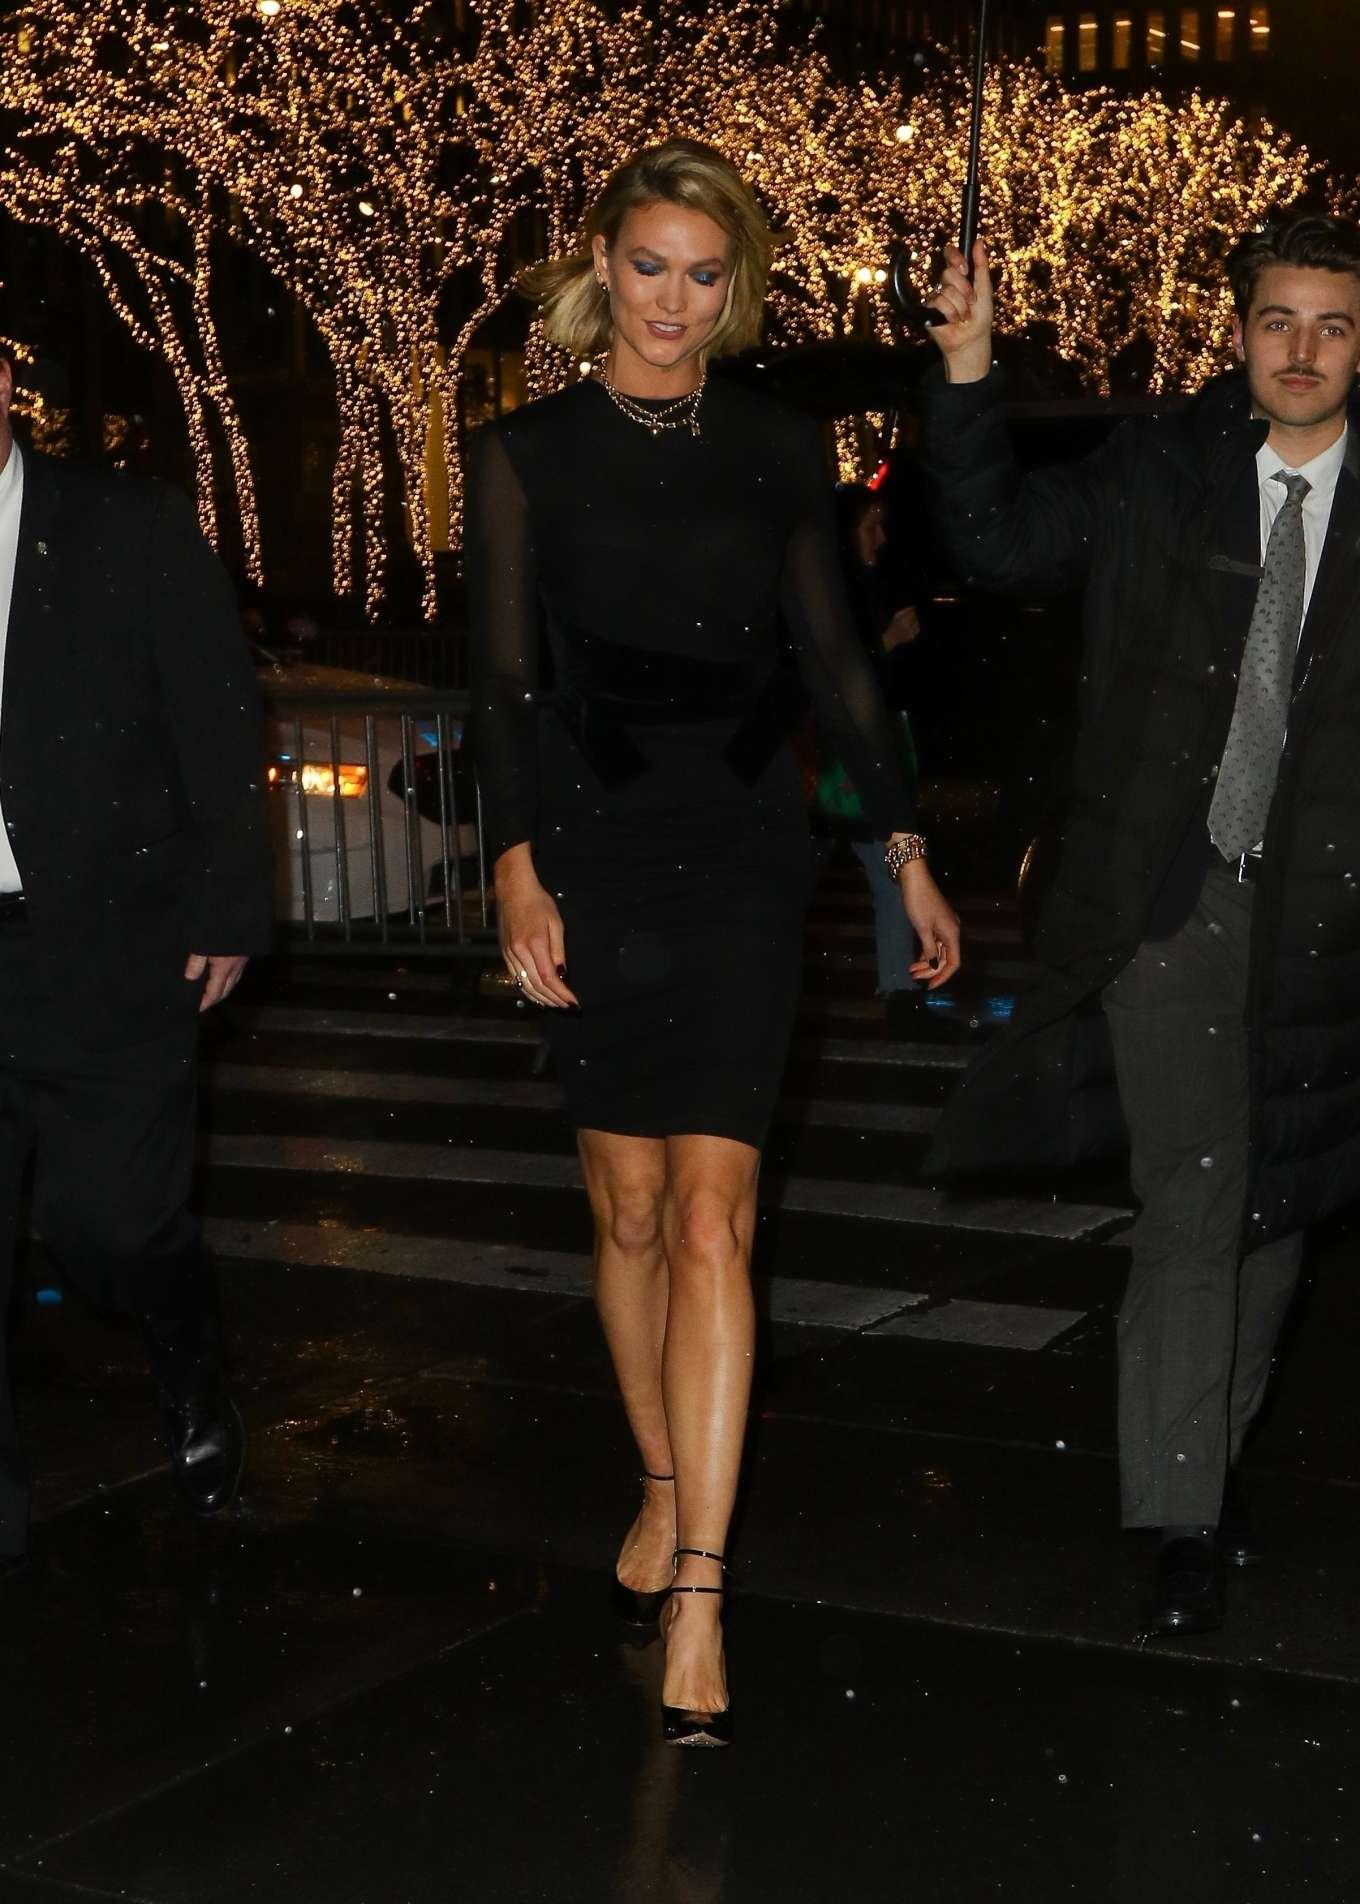 Karlie Kloss 2019 : Karlie Kloss – Arrives at The Tonight Show Starring Jimmy Fallon-04